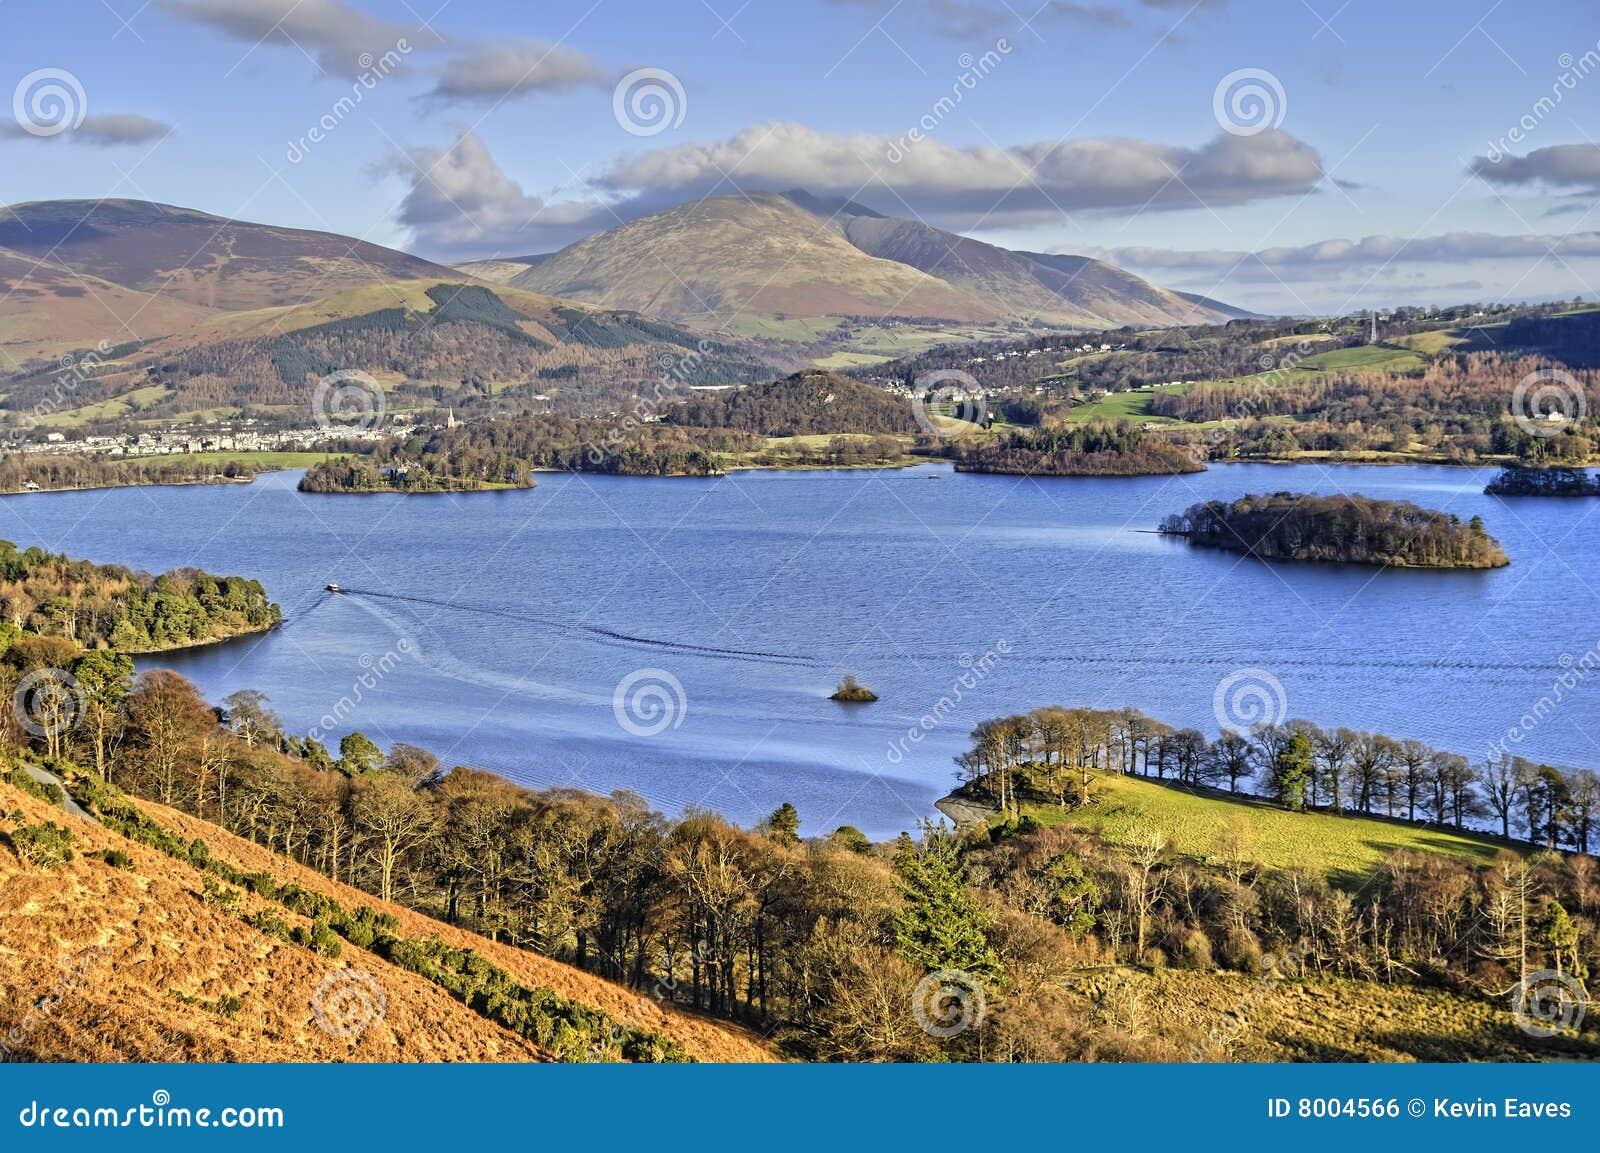 Northern Derwent Water and Keswick